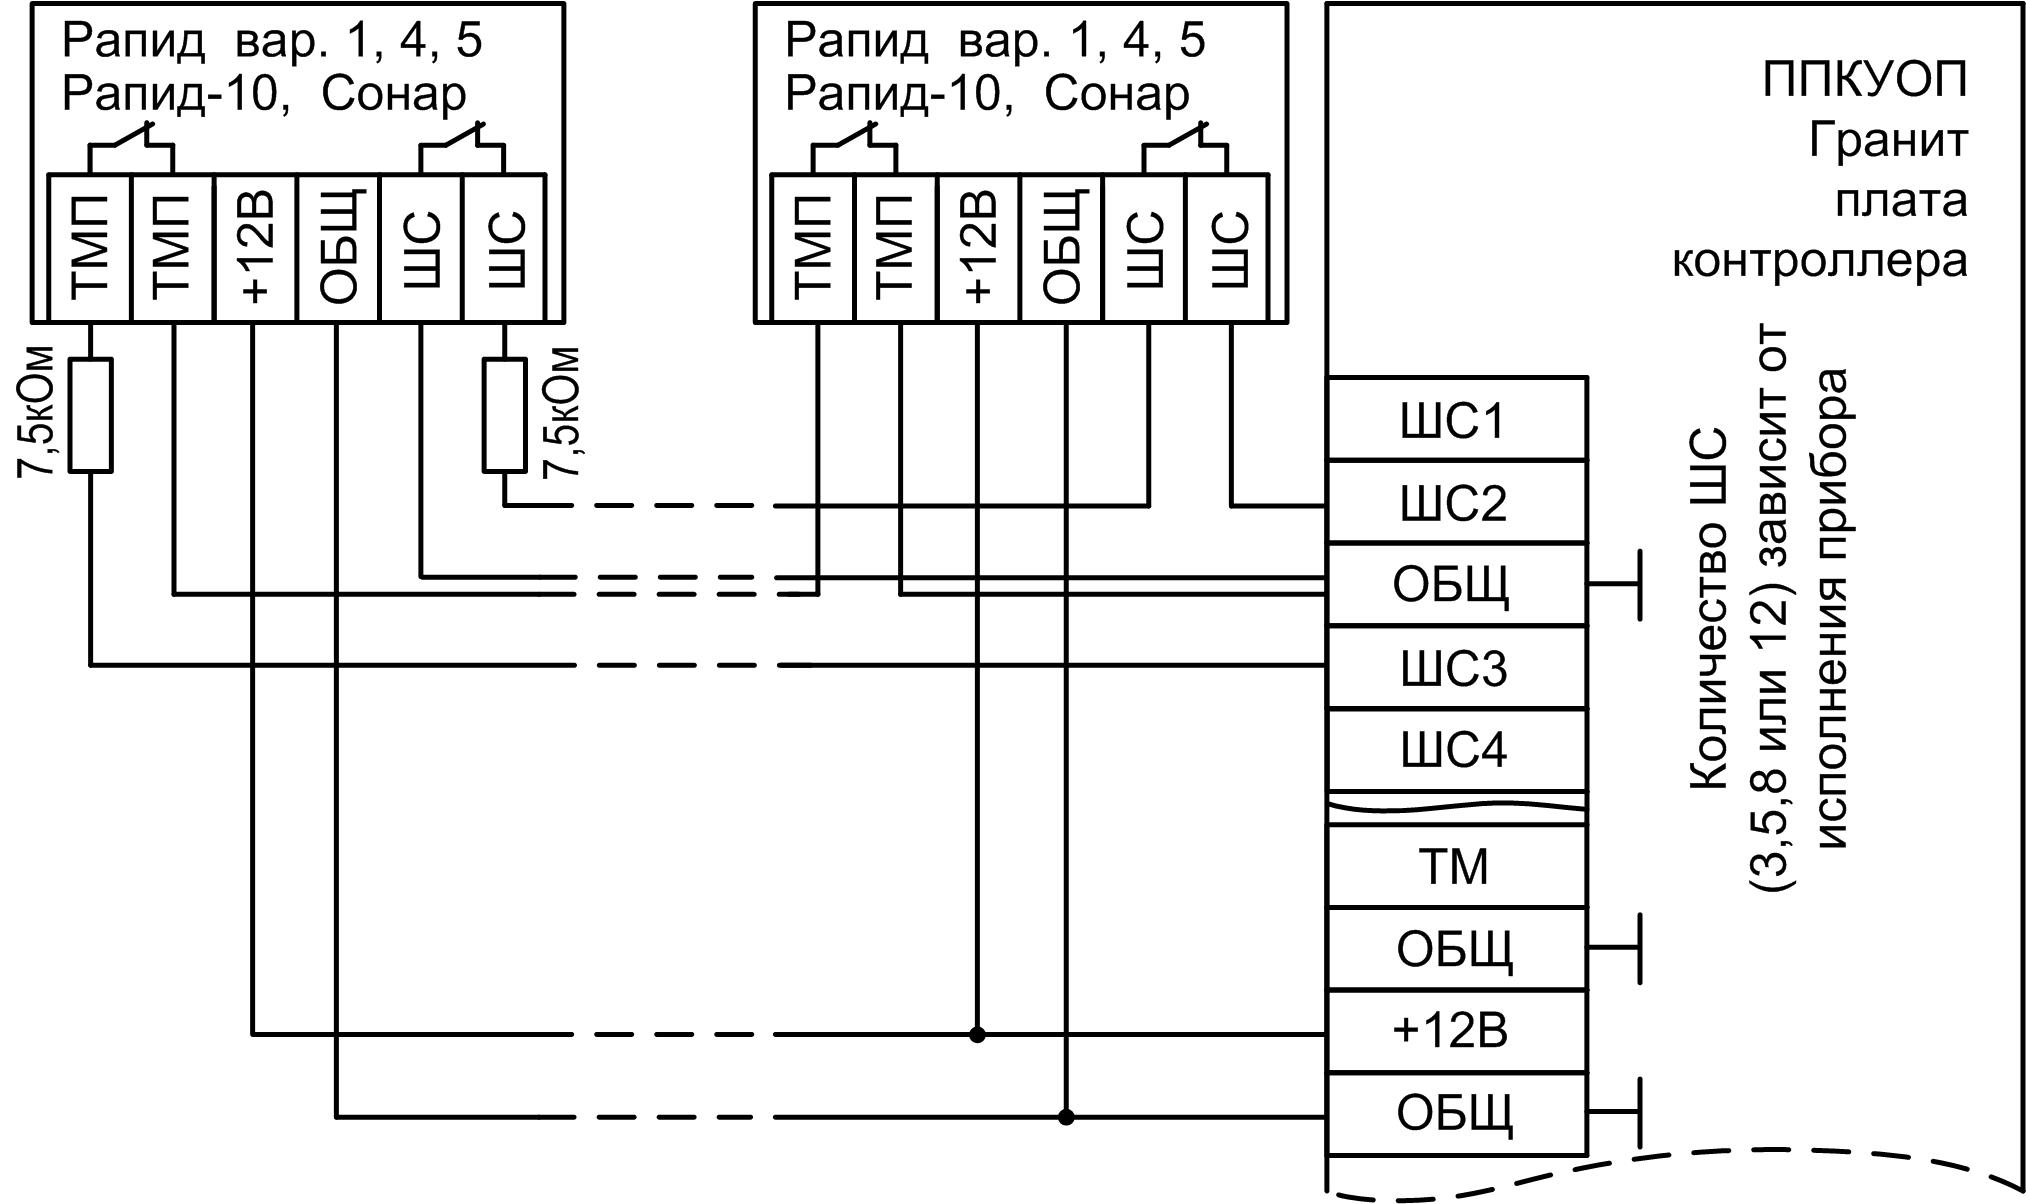 Схема прибора гранит-8